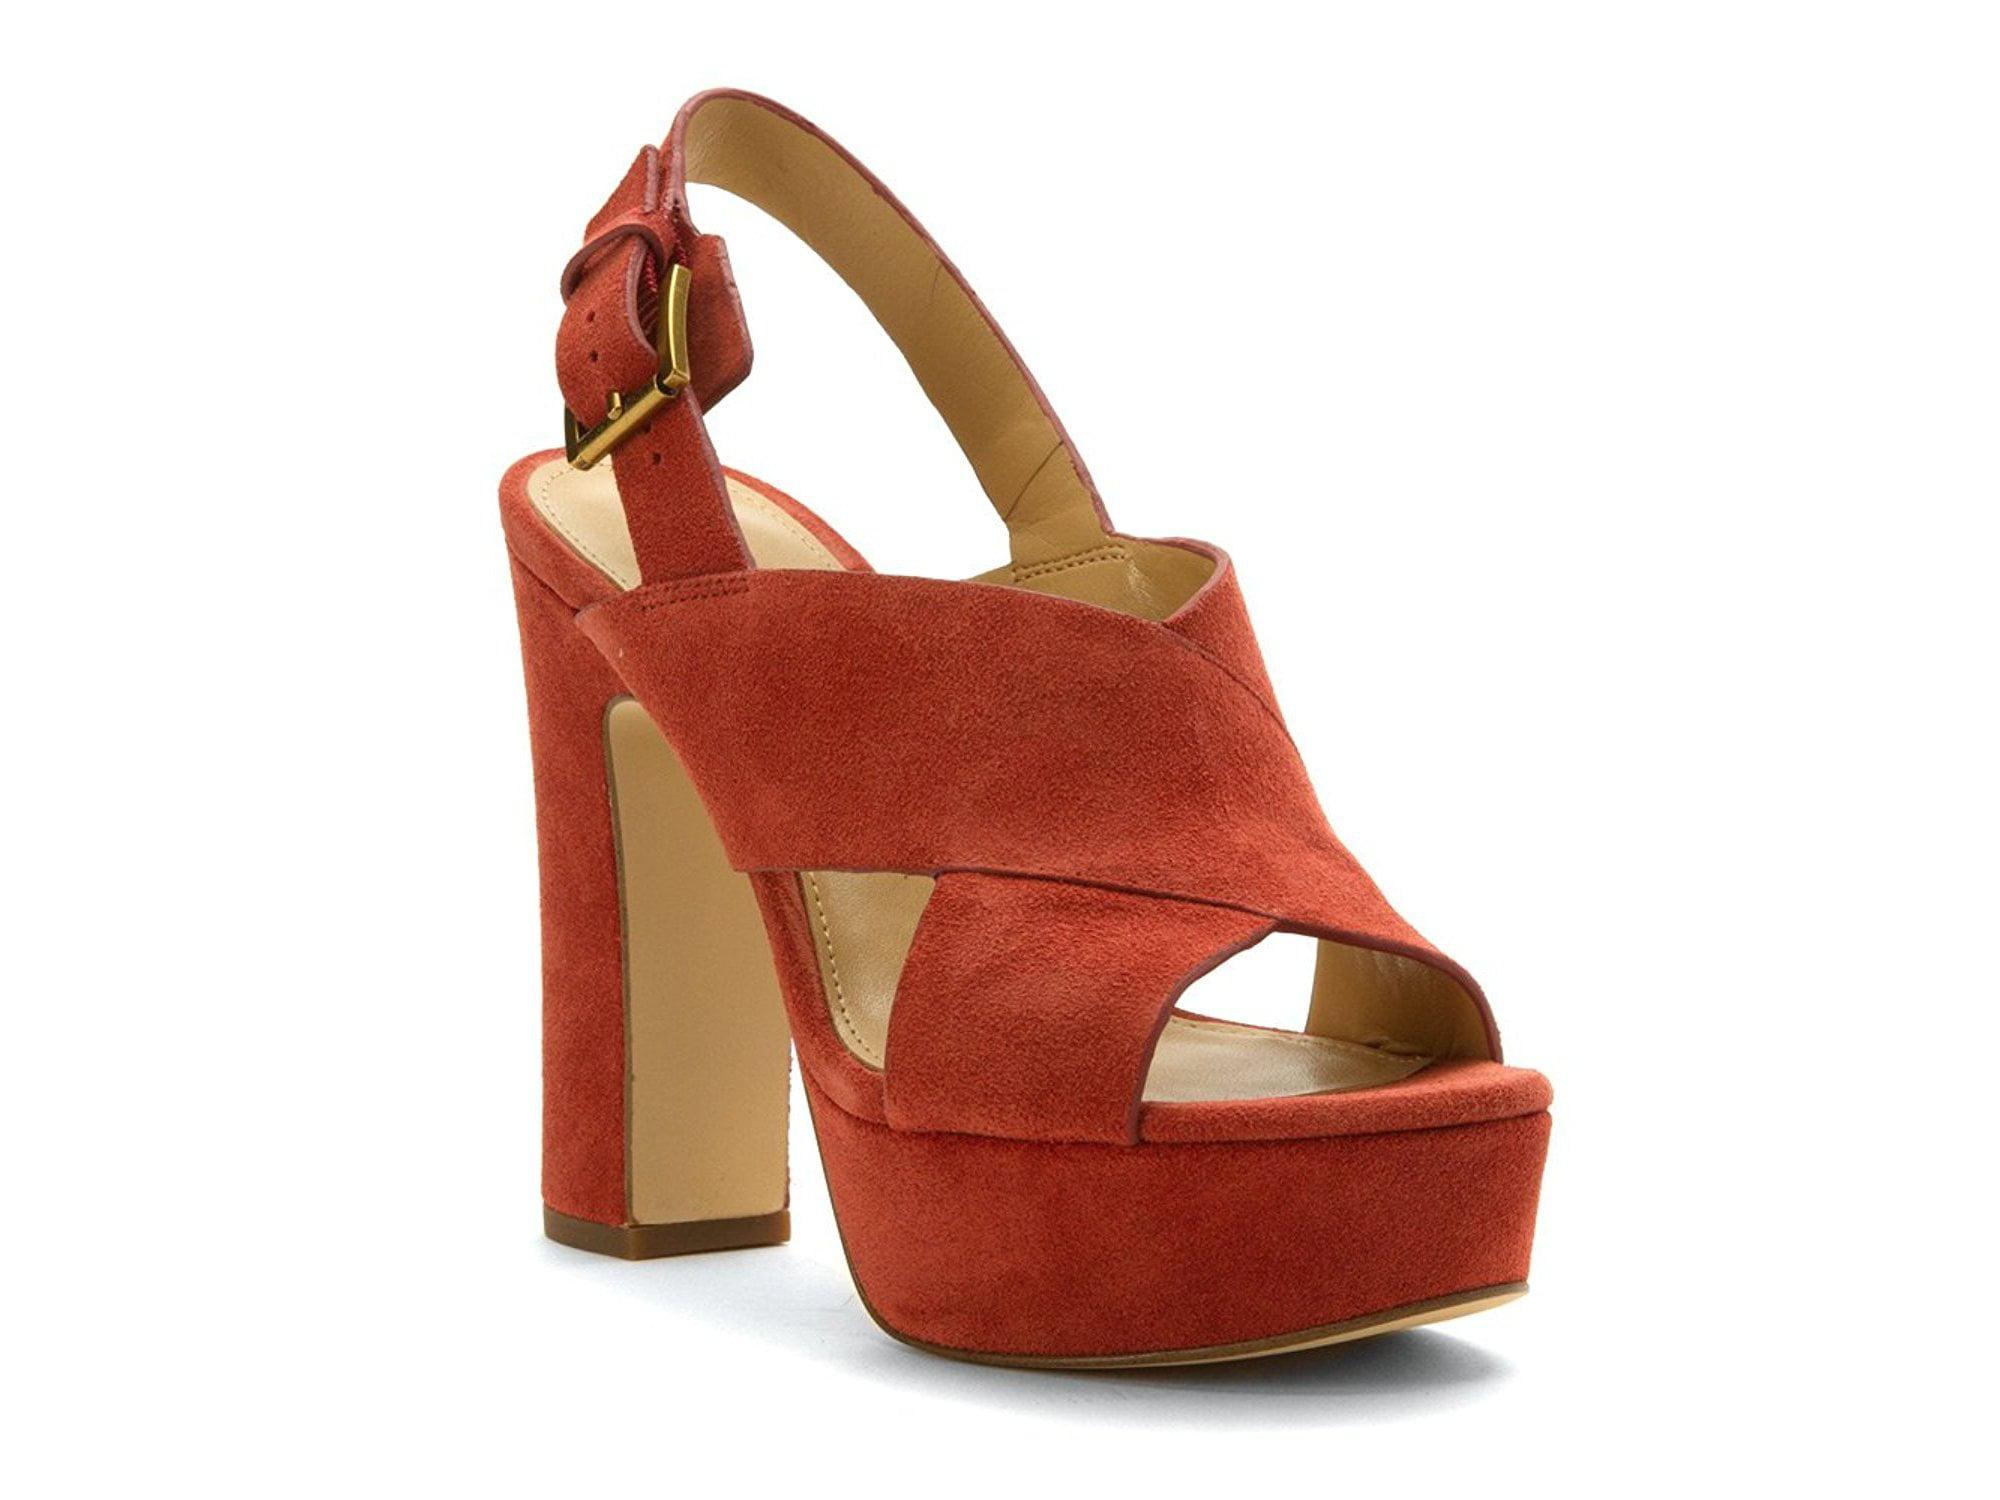 MICHAEL Michael Kors Women's Mariana Sling Sandals by MICHAEL Michael Kors